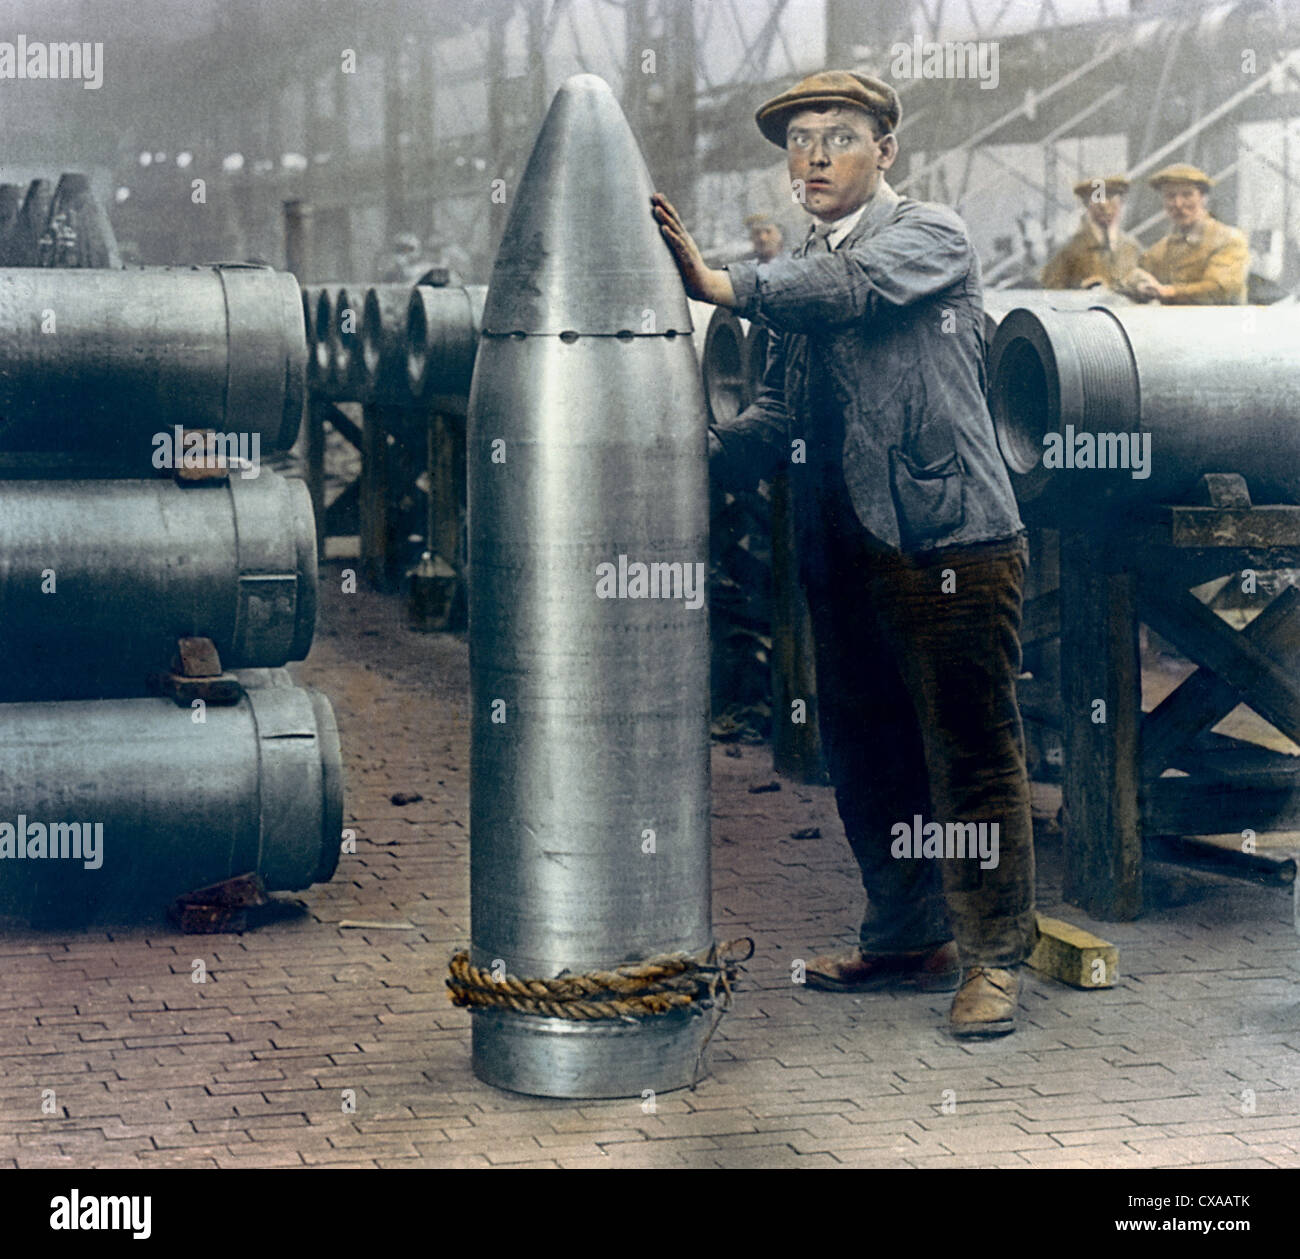 Fábrica de Municiones, Inglaterra, 1918 Imagen De Stock